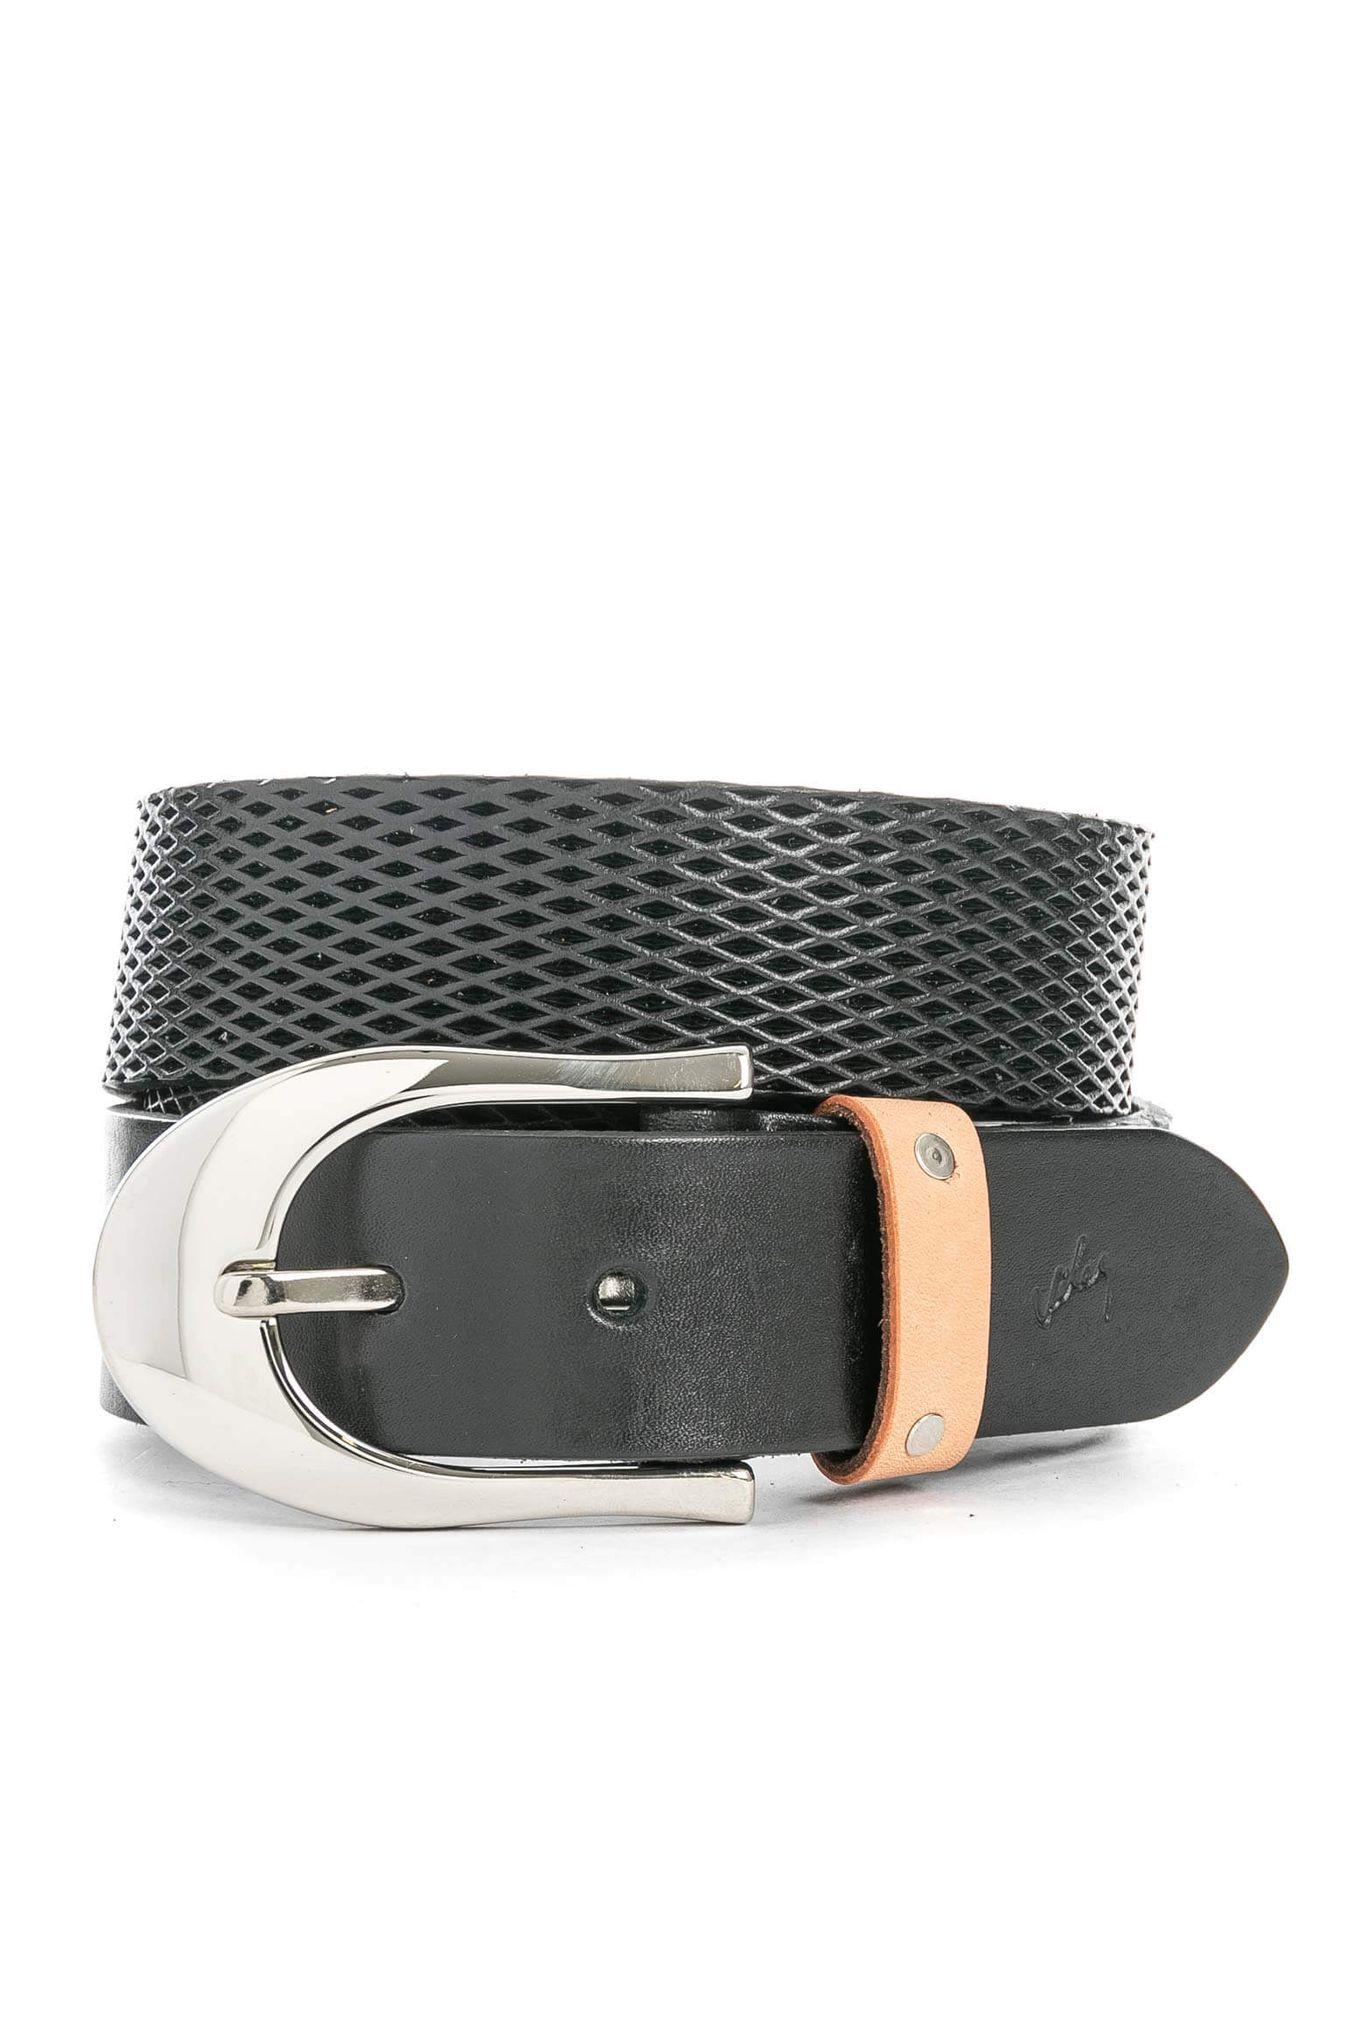 bc359b531 Cinturón unifaz de cuero para mujer 21821 | Unifaz | Vélez - Velez-18